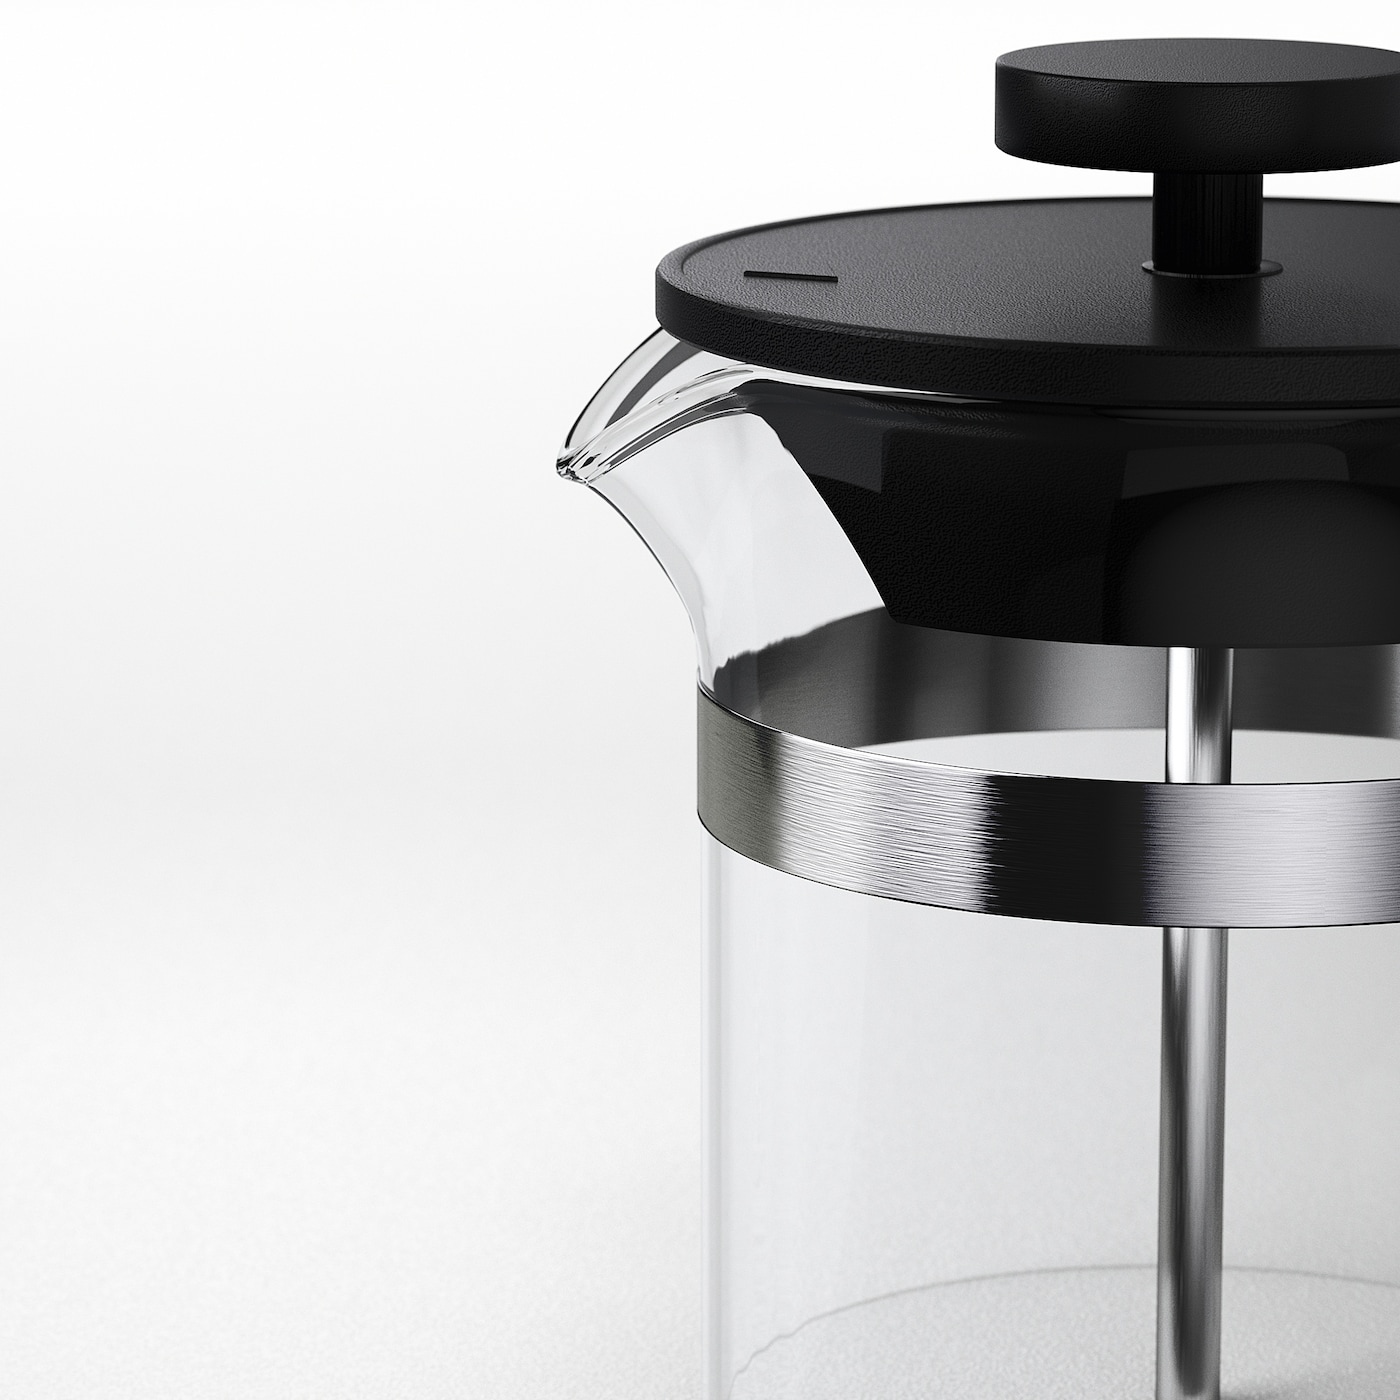 "UPPHETTA French press coffee maker glass/stainless steel 7 "" 3 "" 13.5 oz"